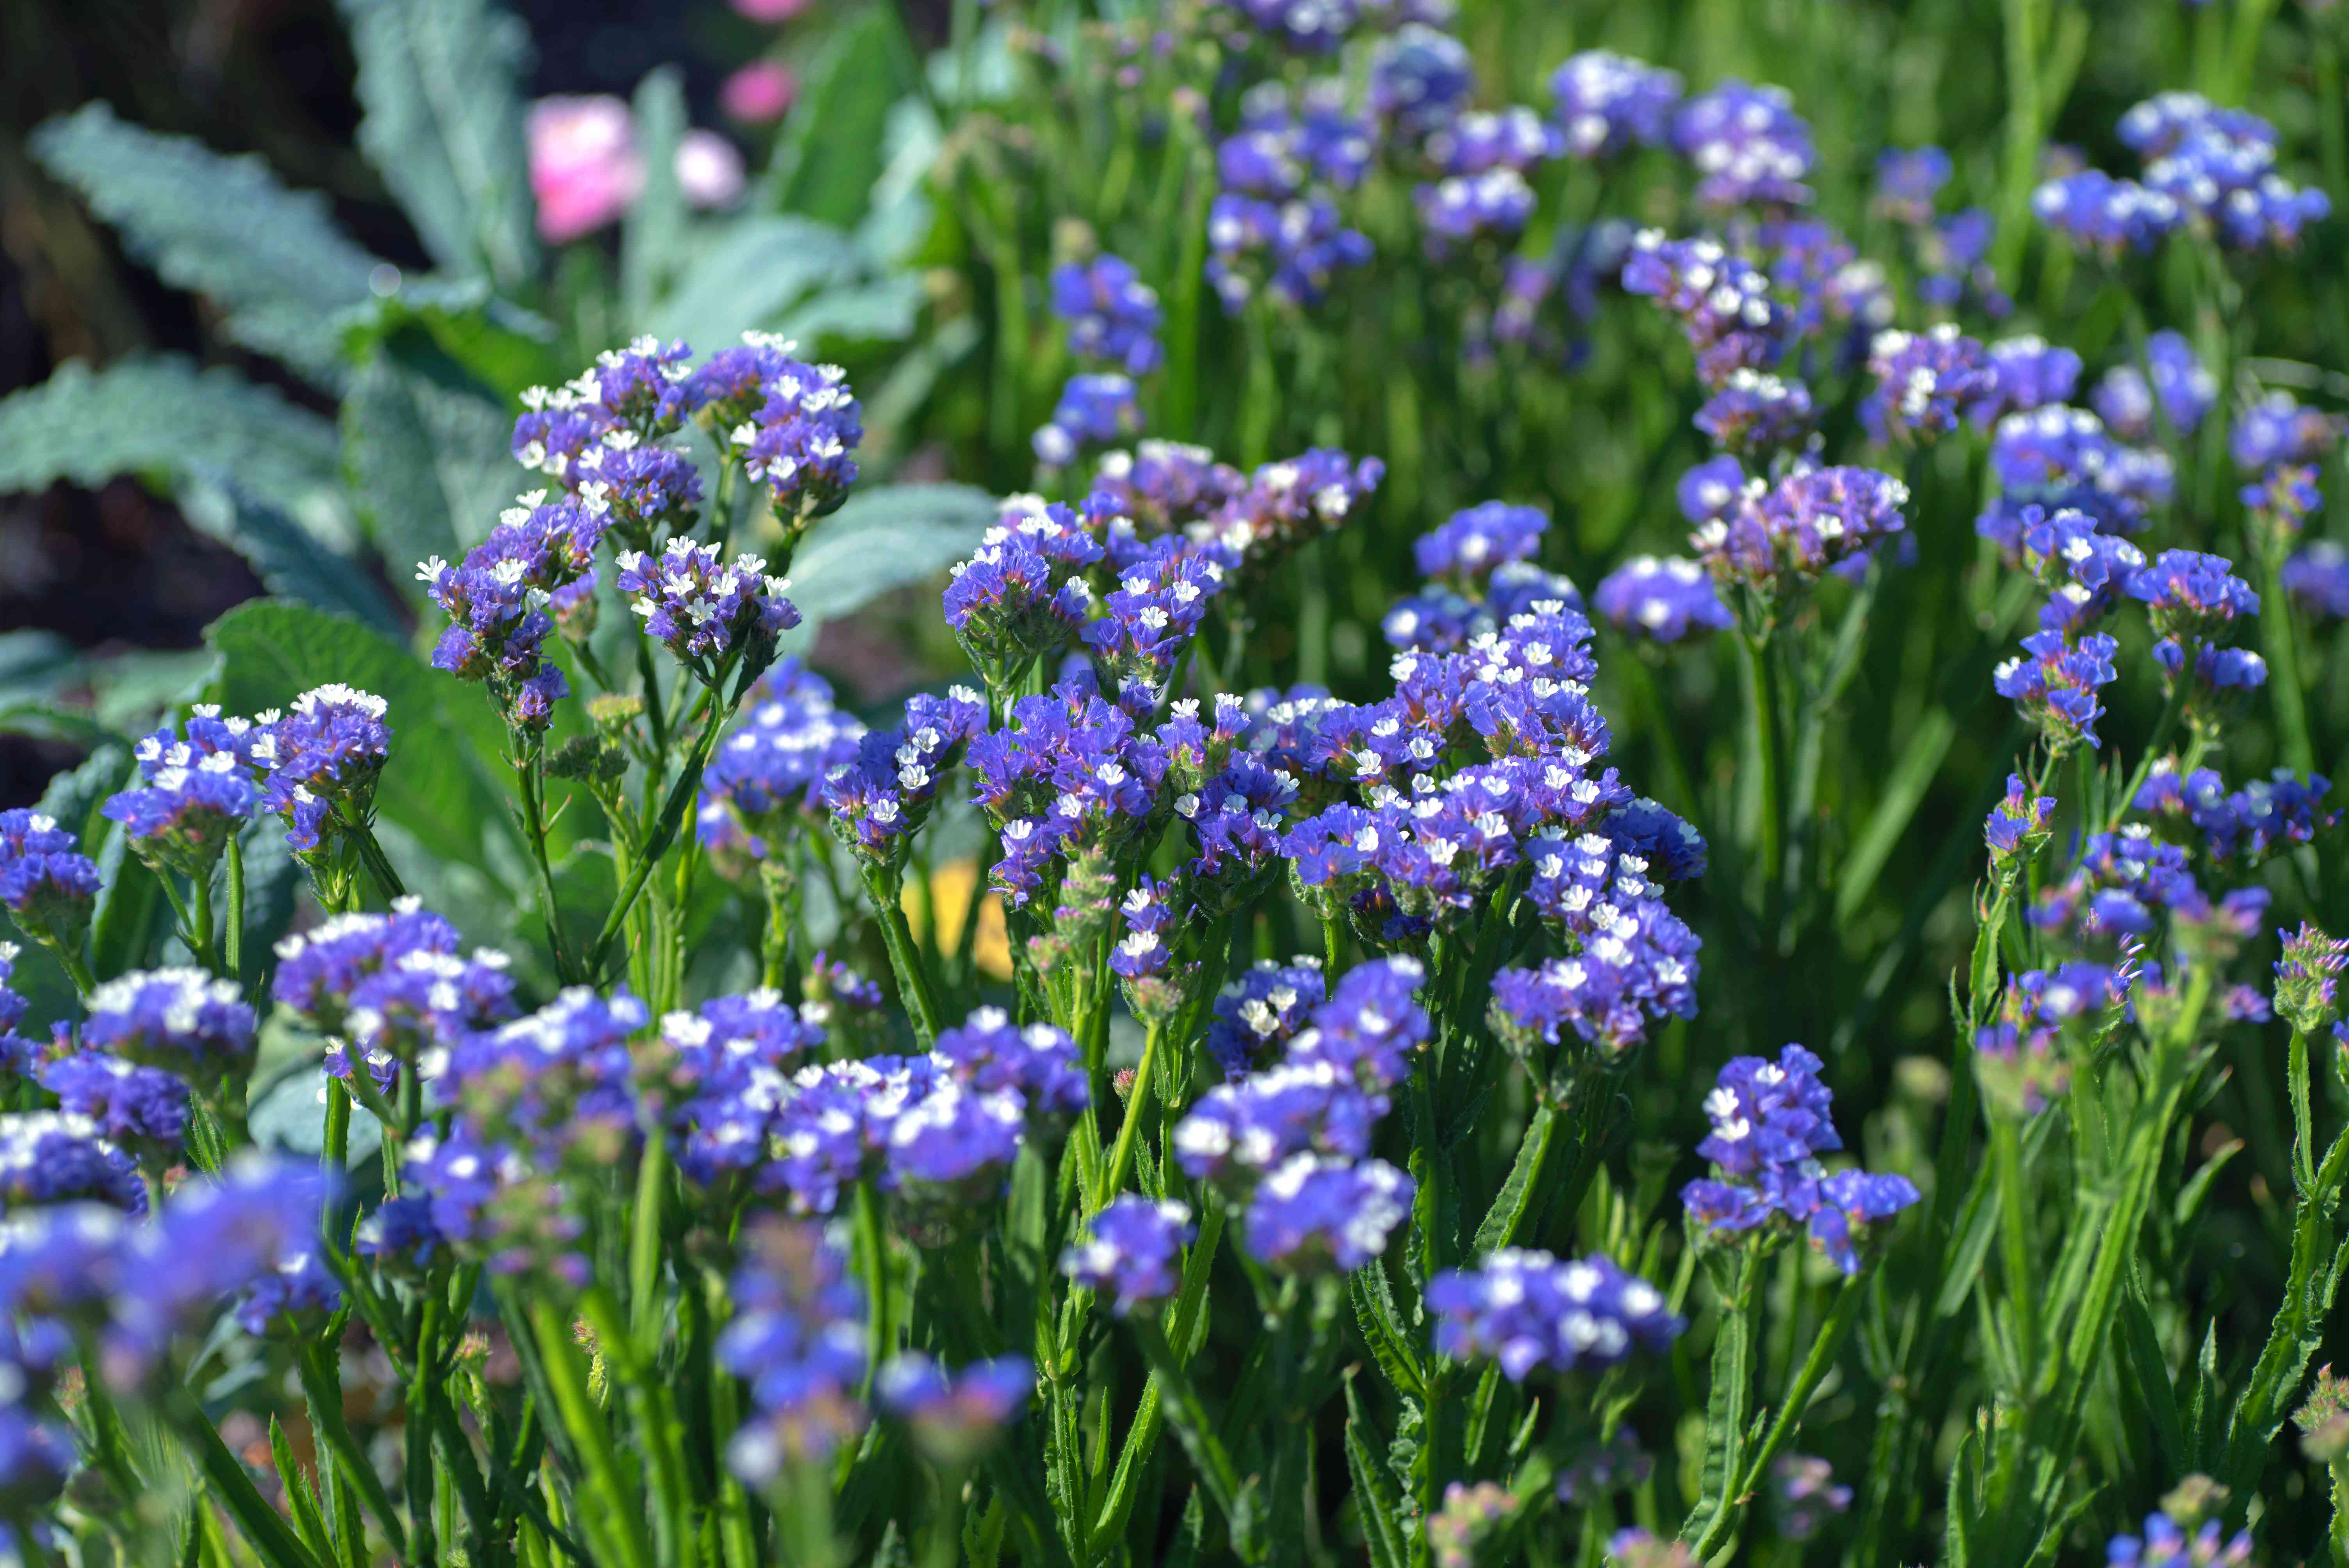 Sea lavender flowers